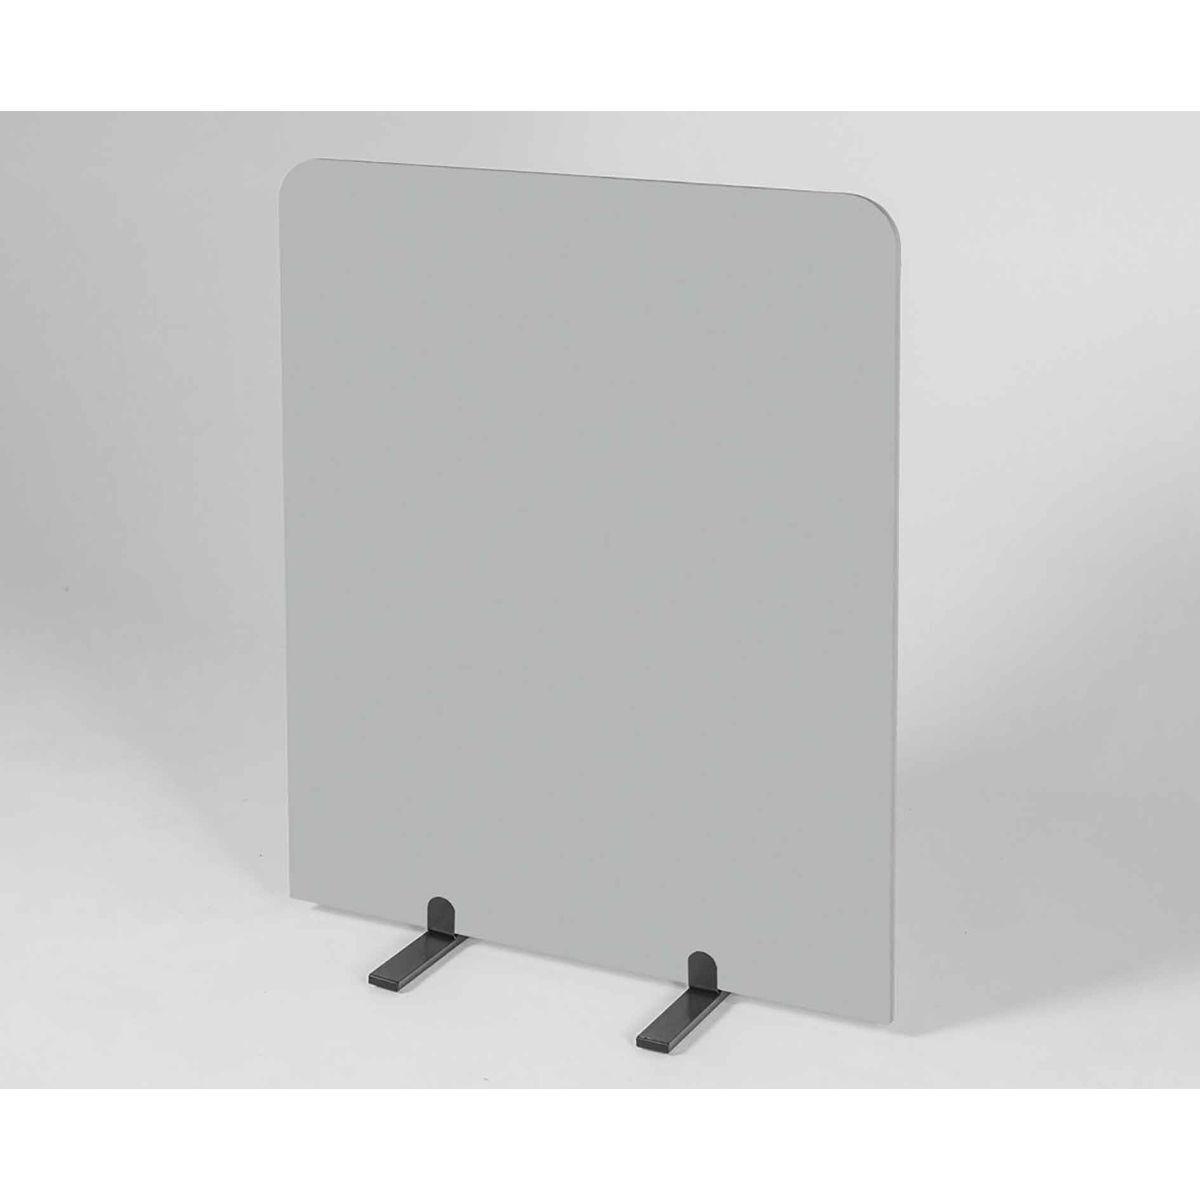 Metroplan BusyScreen Curve Screen 1600 x 1200mm Light Grey